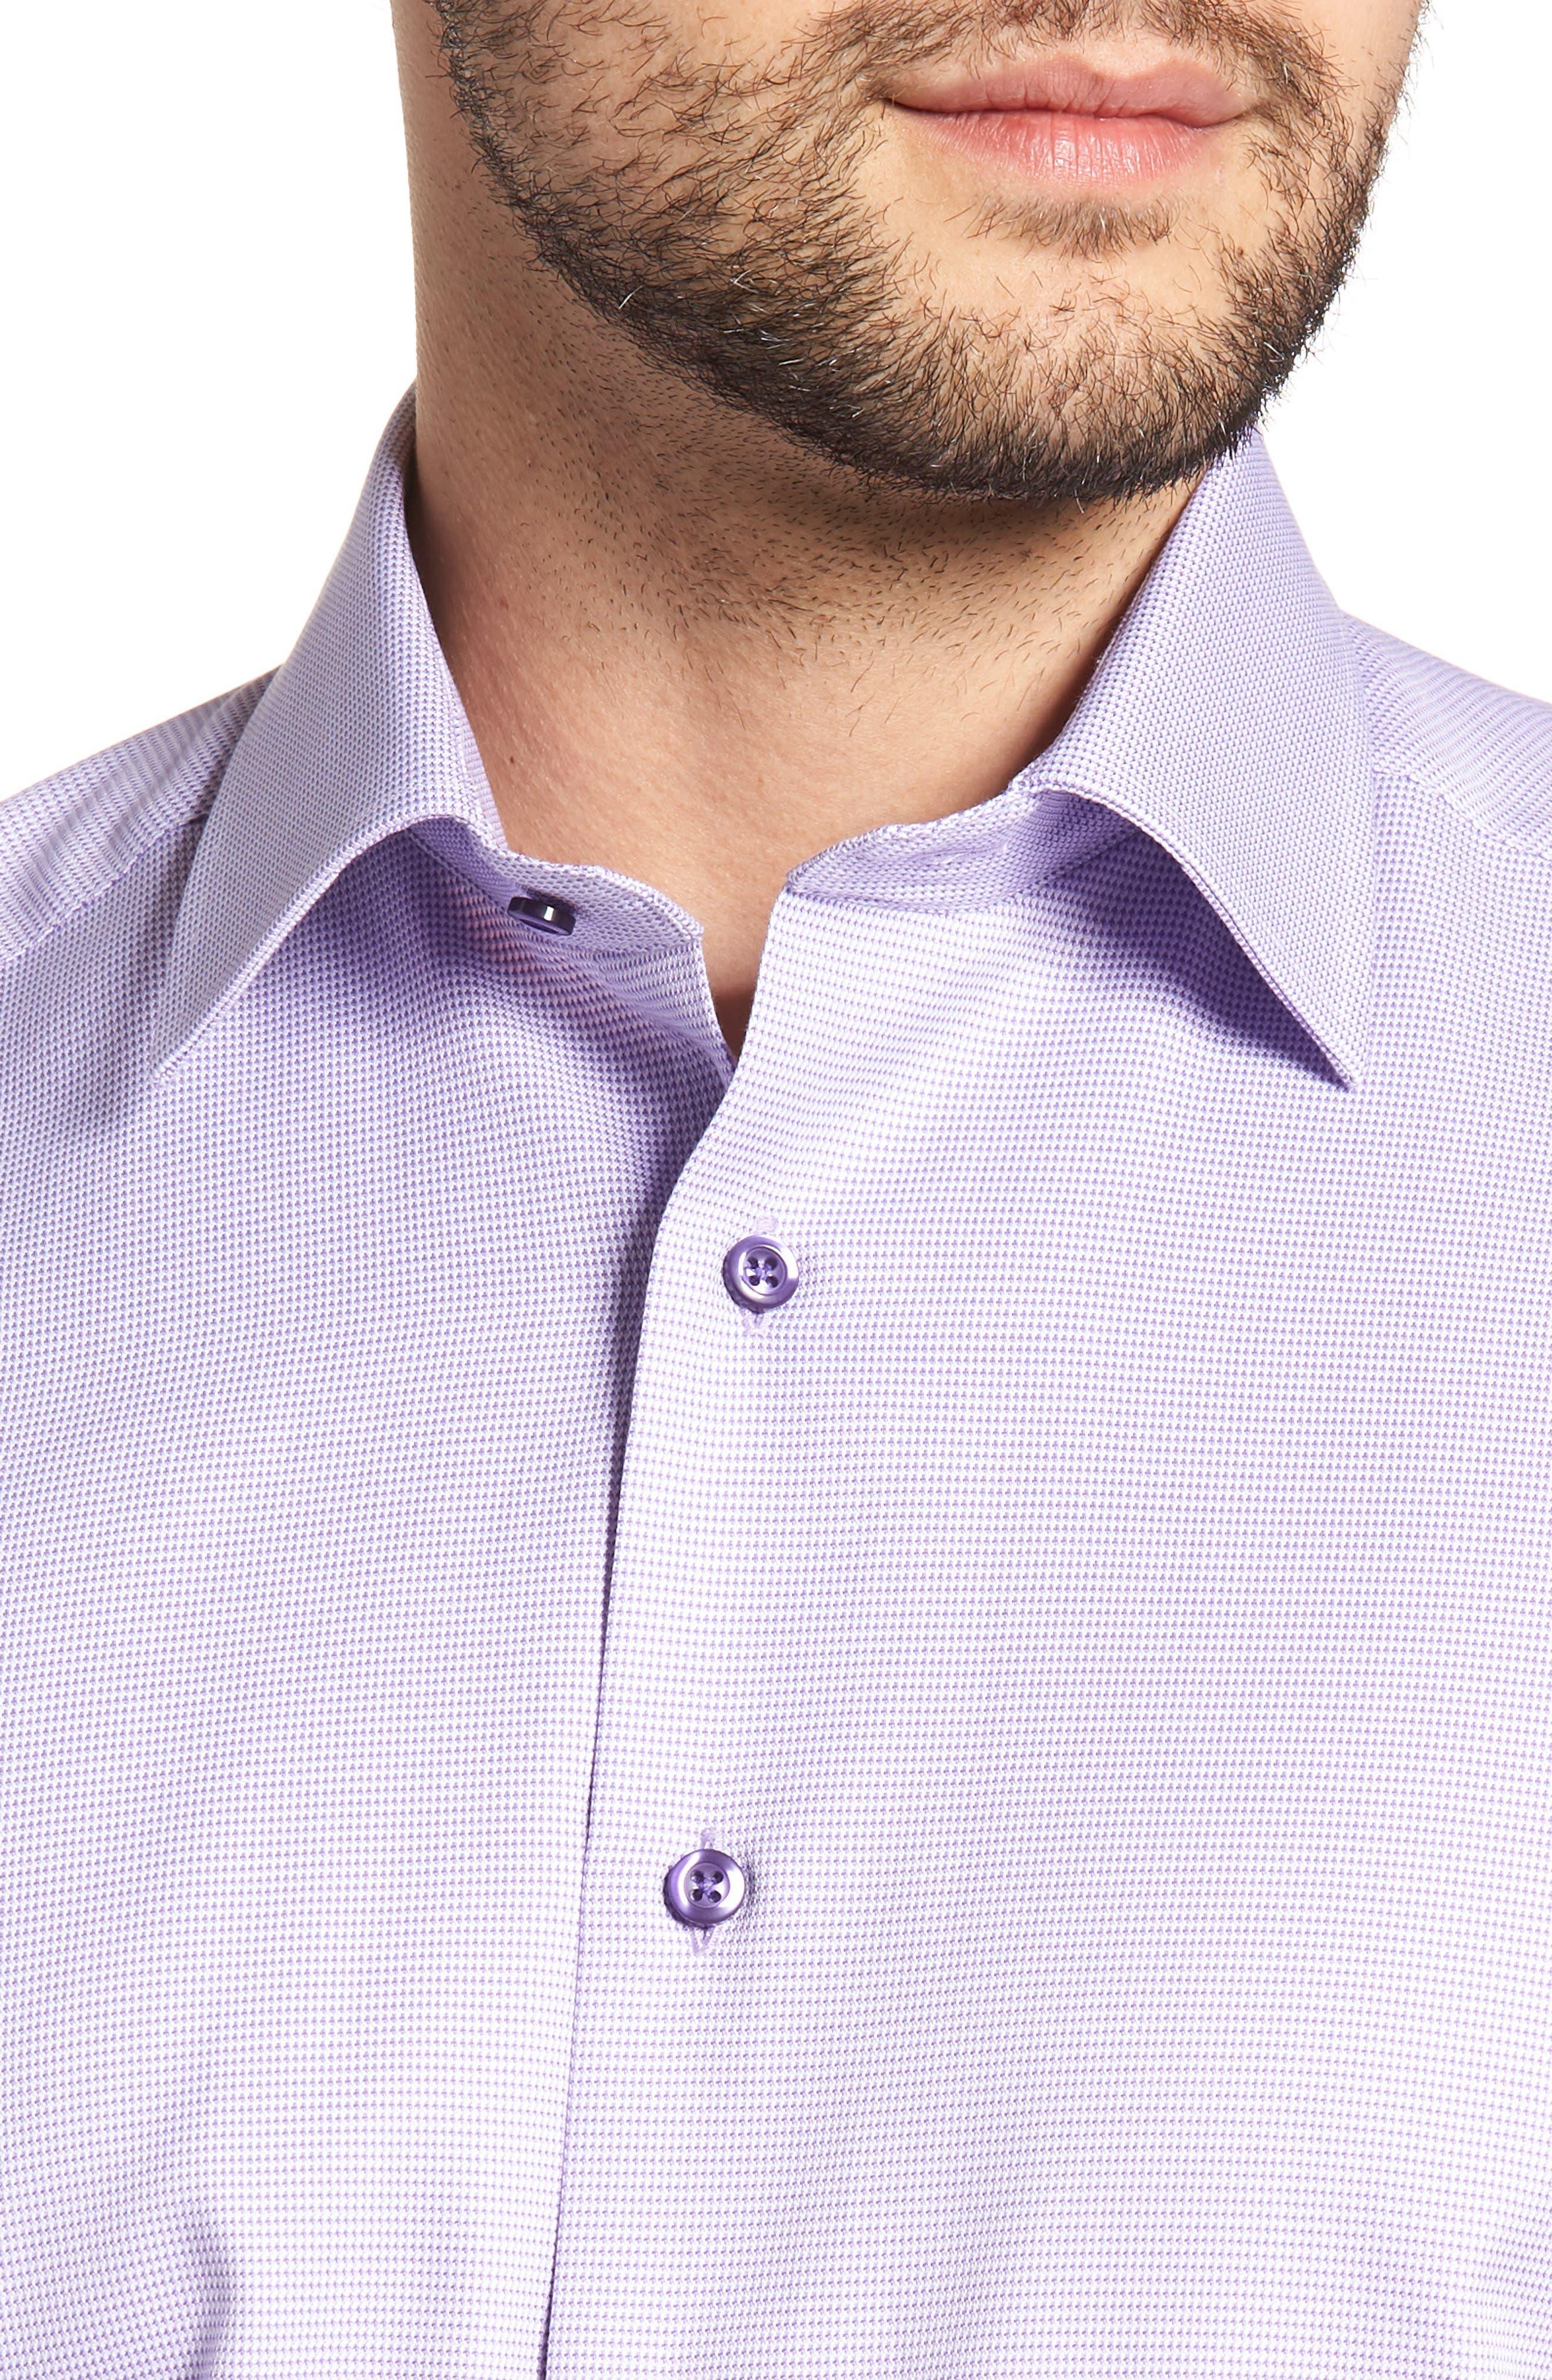 Regular Fit Solid Dress Shirt,                             Alternate thumbnail 2, color,                             Lilac